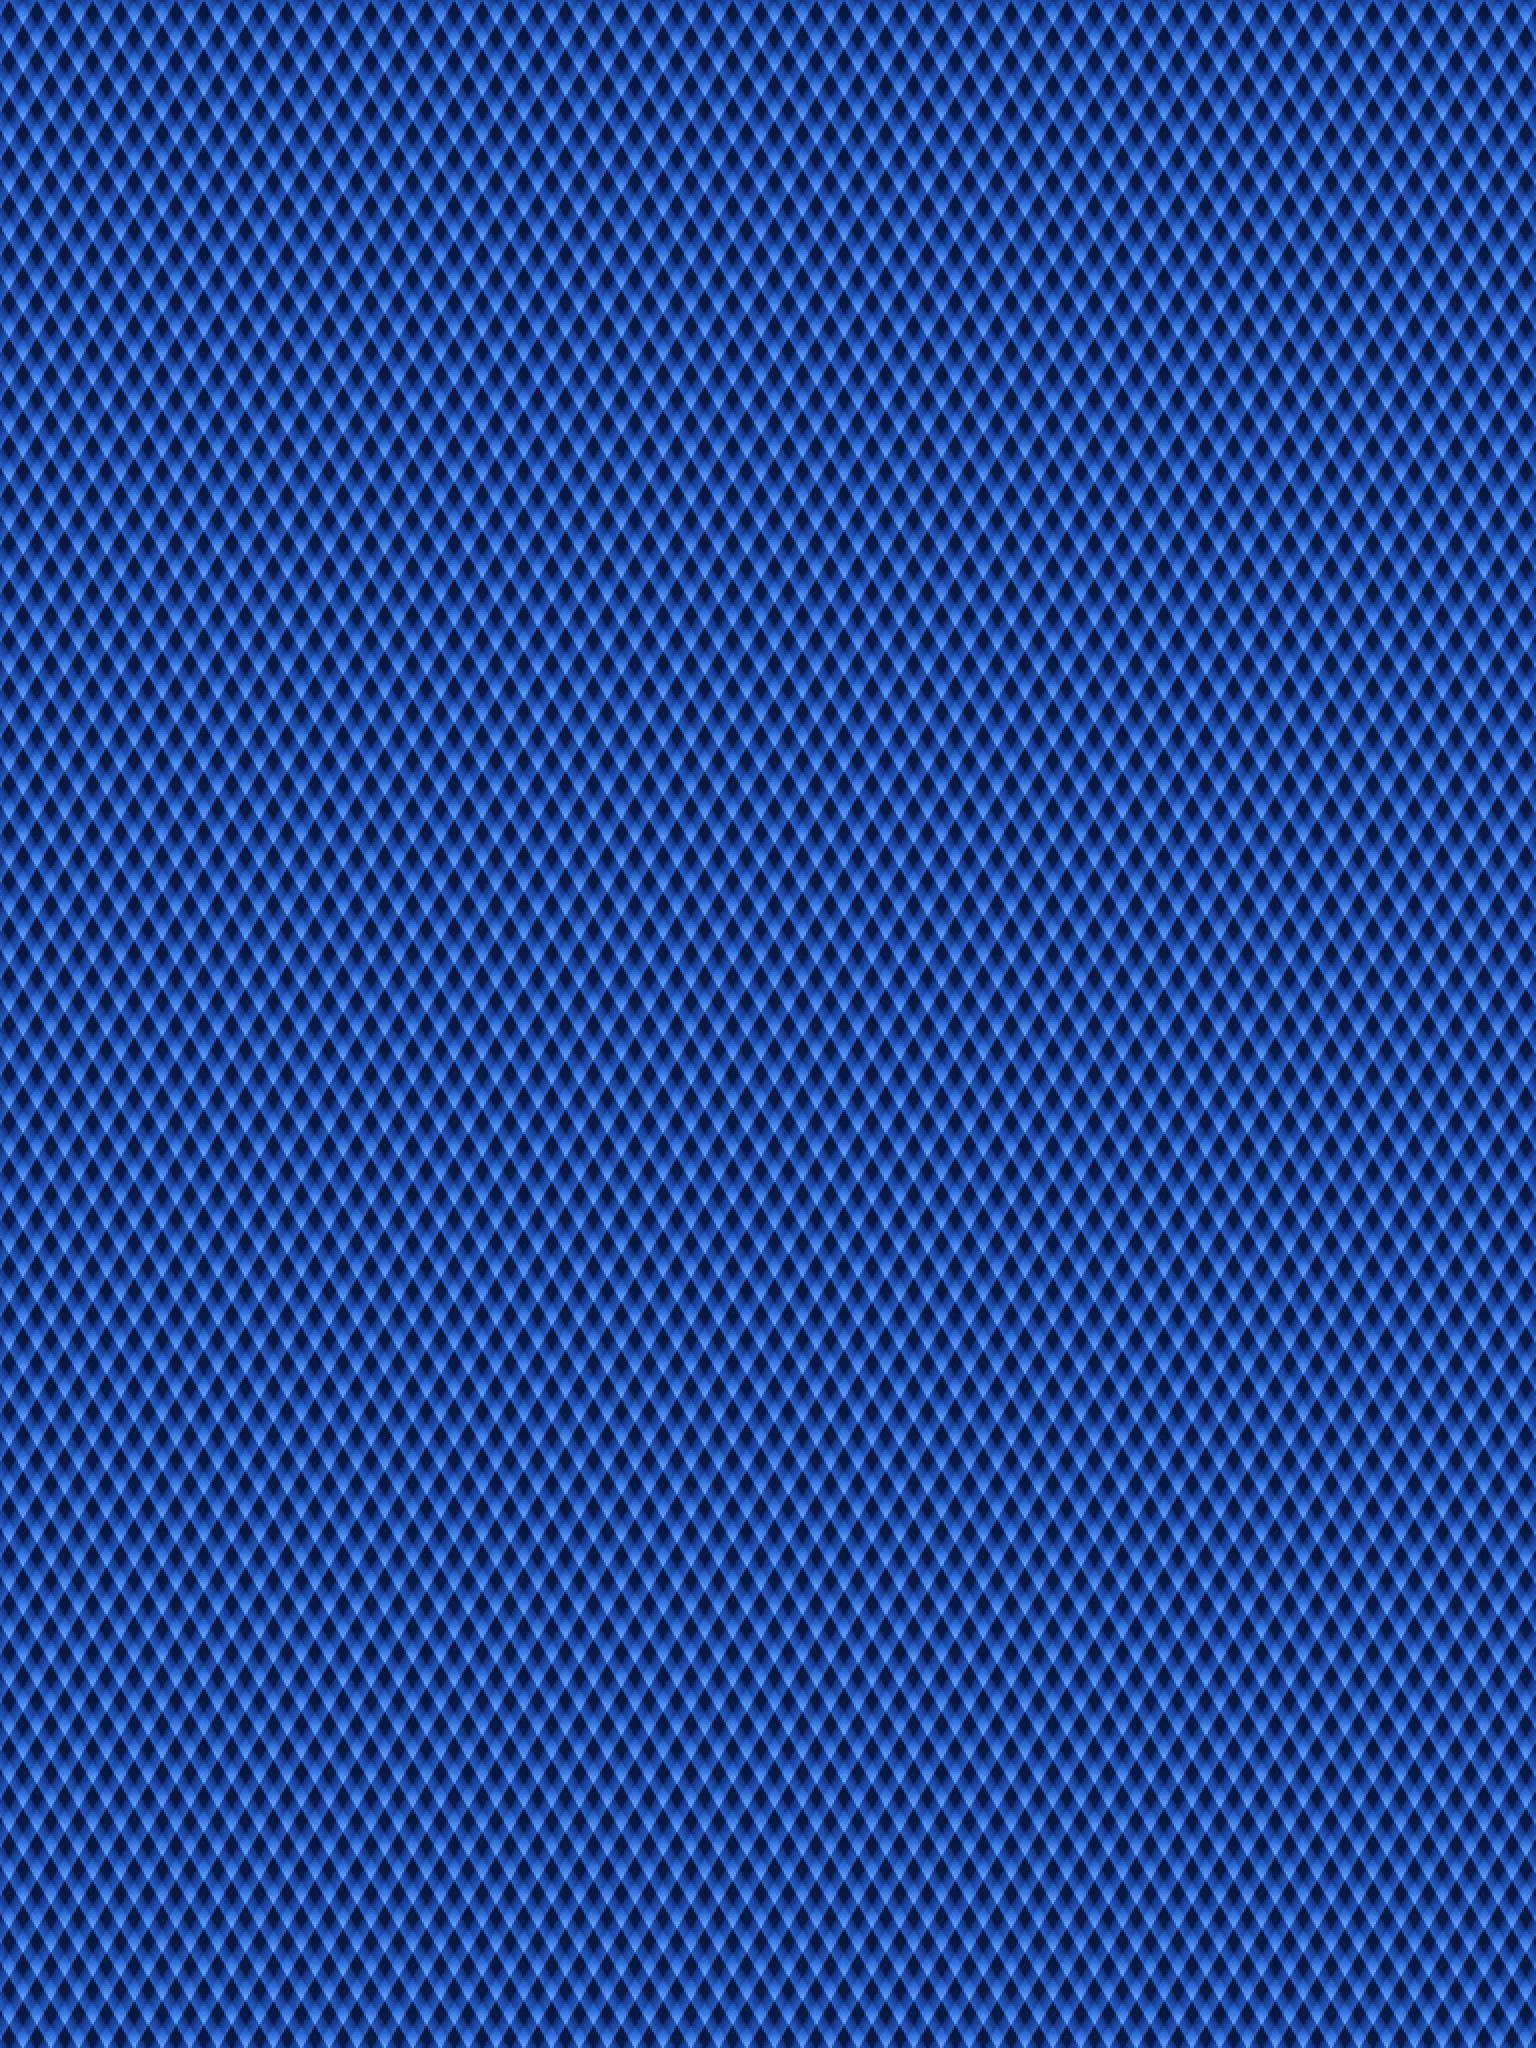 Free Download Backgrounds Blue Diamond Pattern Background Ipad Iphone Hd 2048x2048 For Your Desktop Mobile Tablet Explore 45 Blue Diamond Wallpaper Patterns Diamond Shape Wallpaper Diamond Wallpapers For Desktop